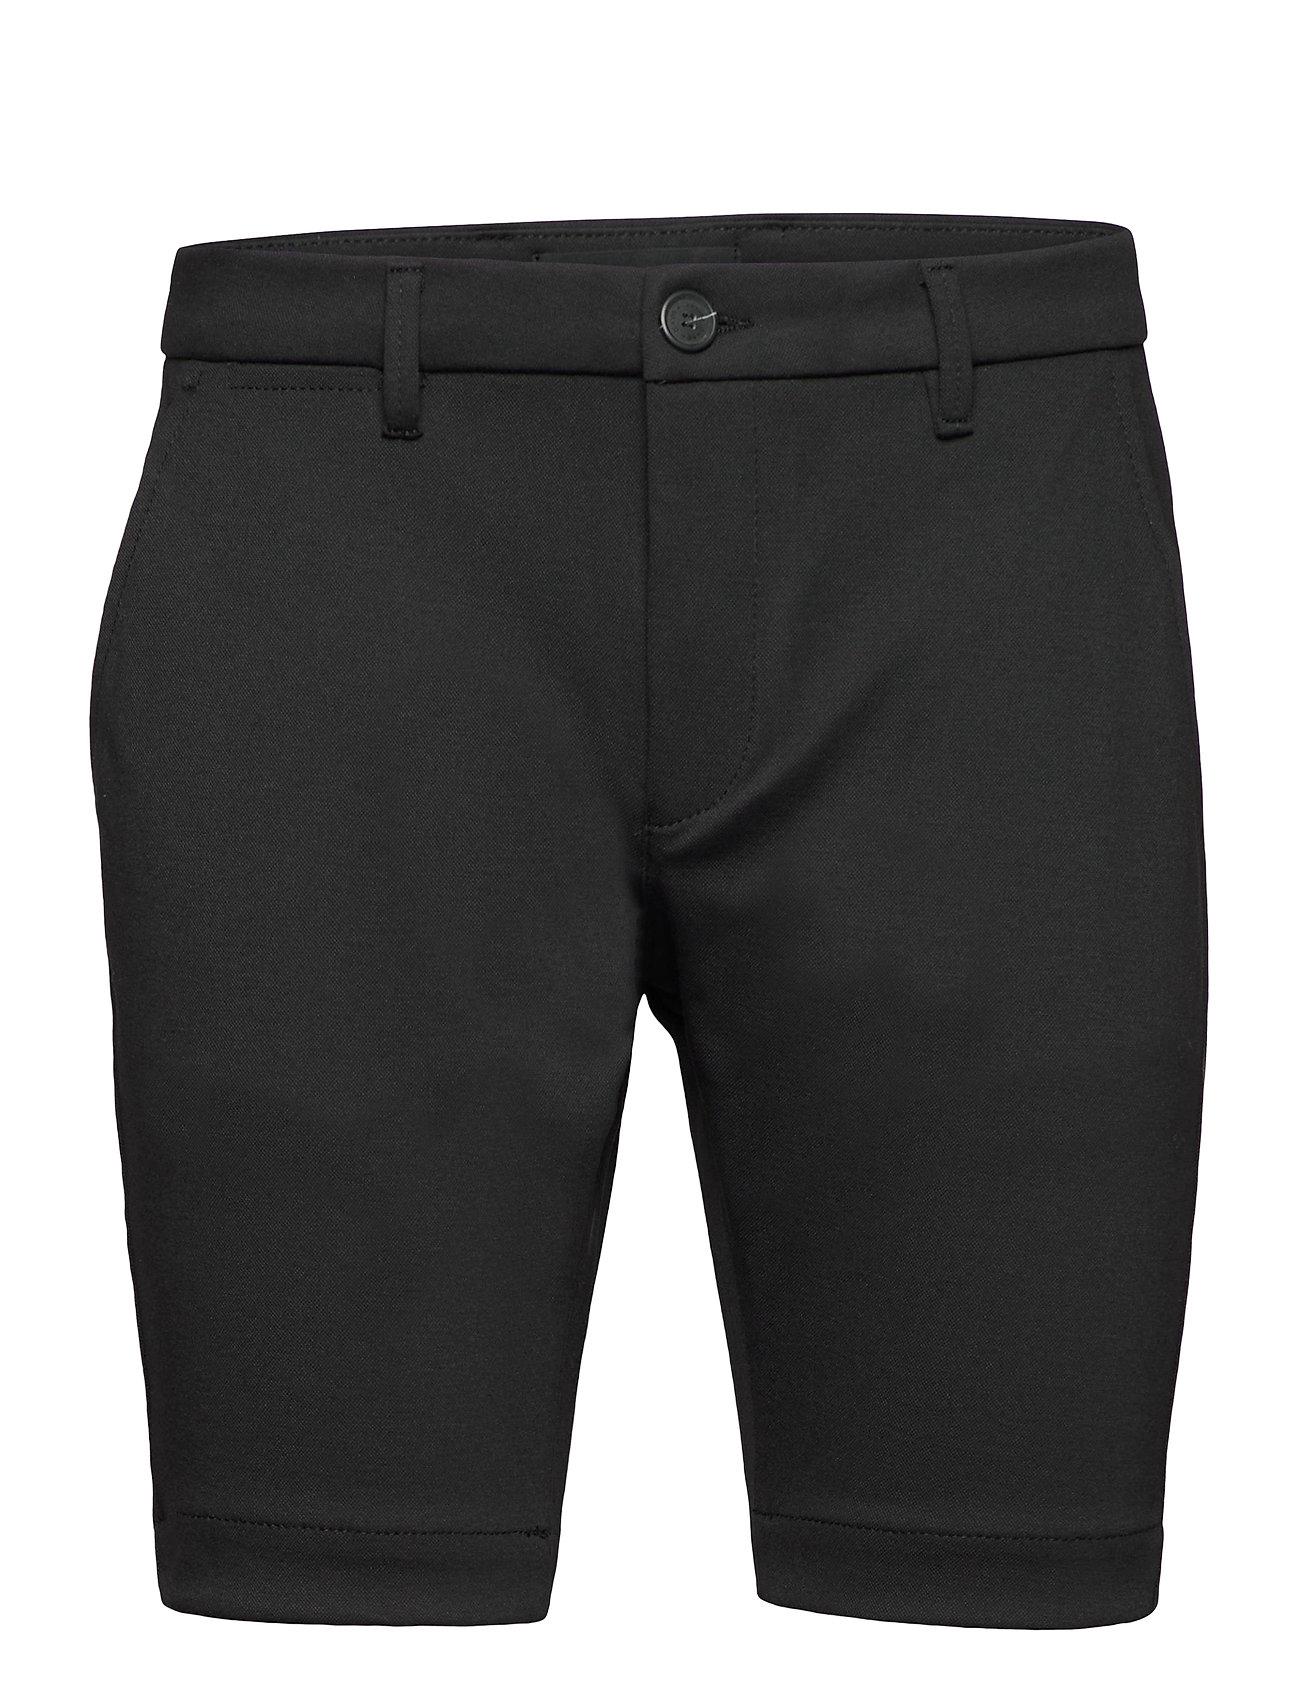 Image of Jason Chino Jersey Shorts Shorts Casual Sort Gabba (3562605951)